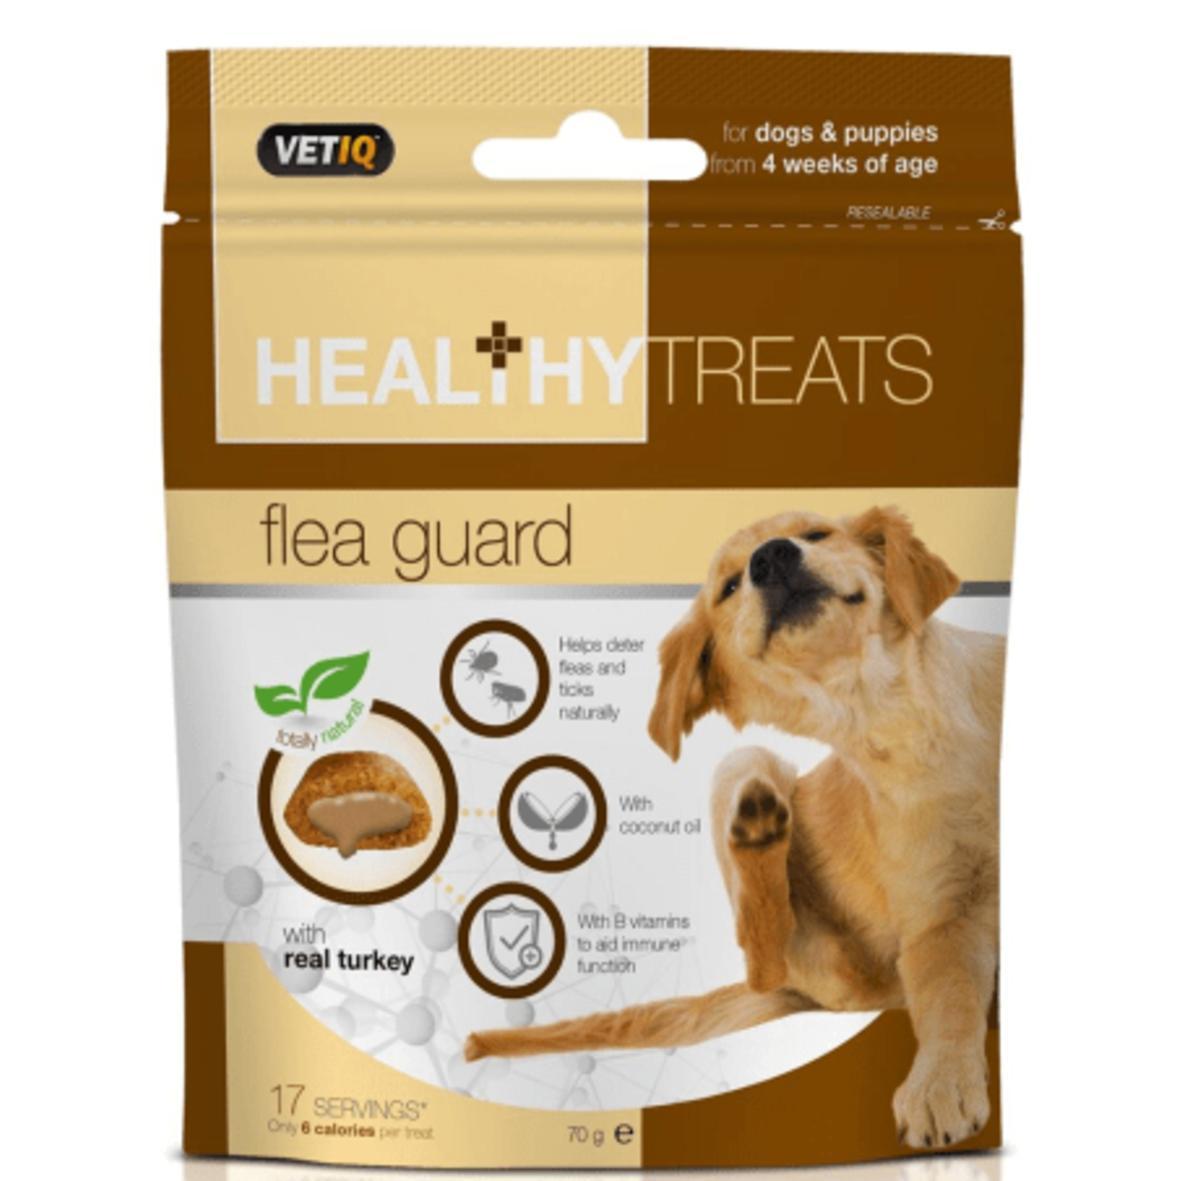 CLEARANCE VetIQ Healthy Treats Flea Guard 70gm